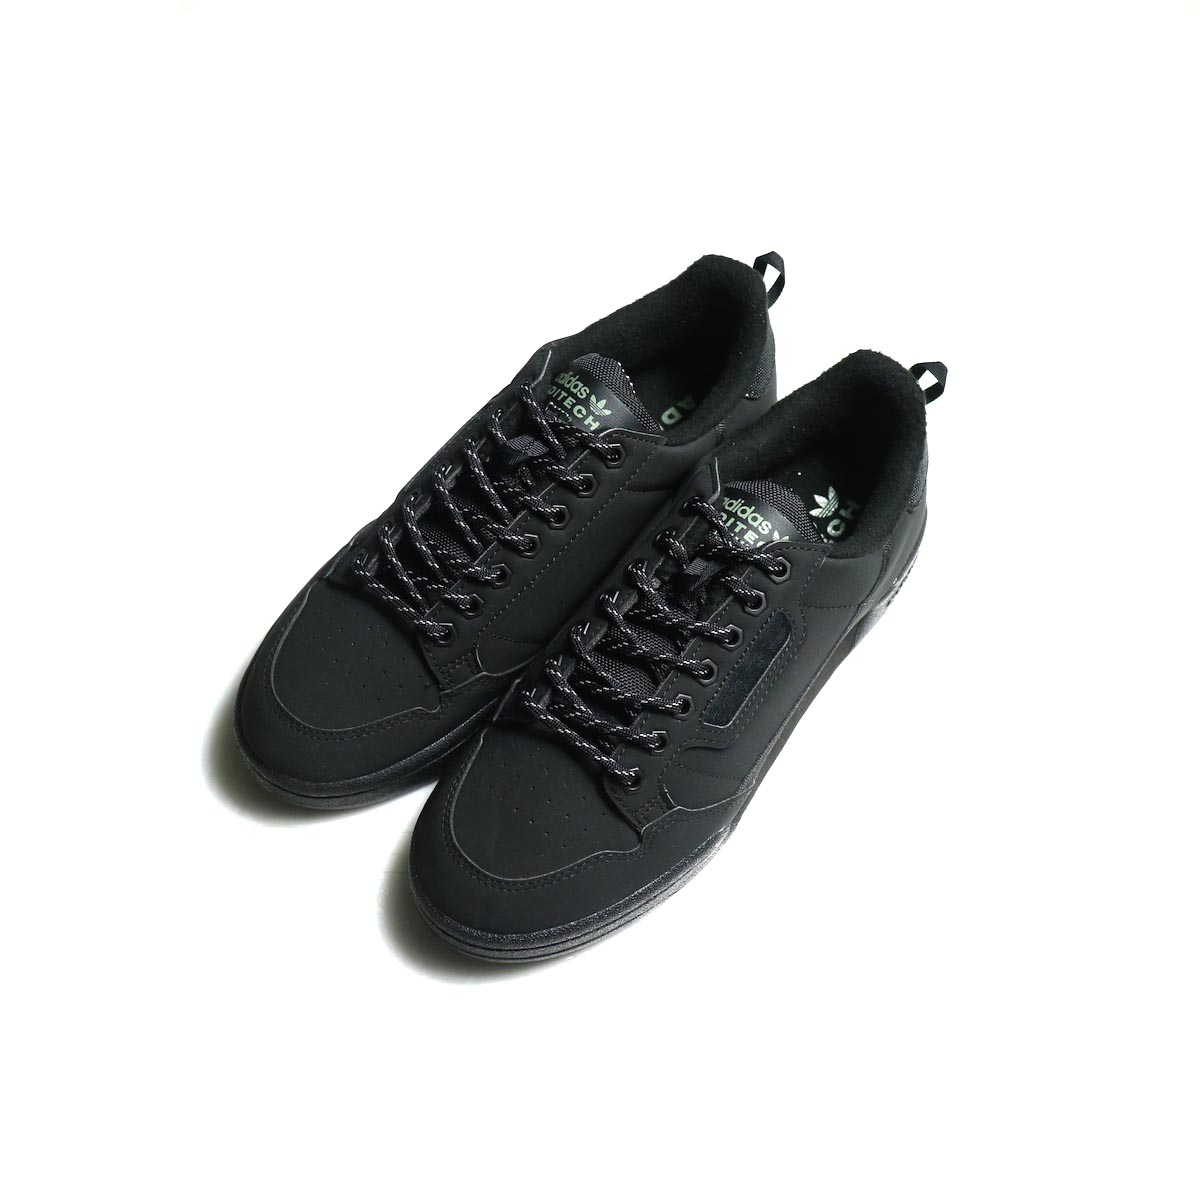 adidas originals / CONTINENTAL80 (コアブラック)